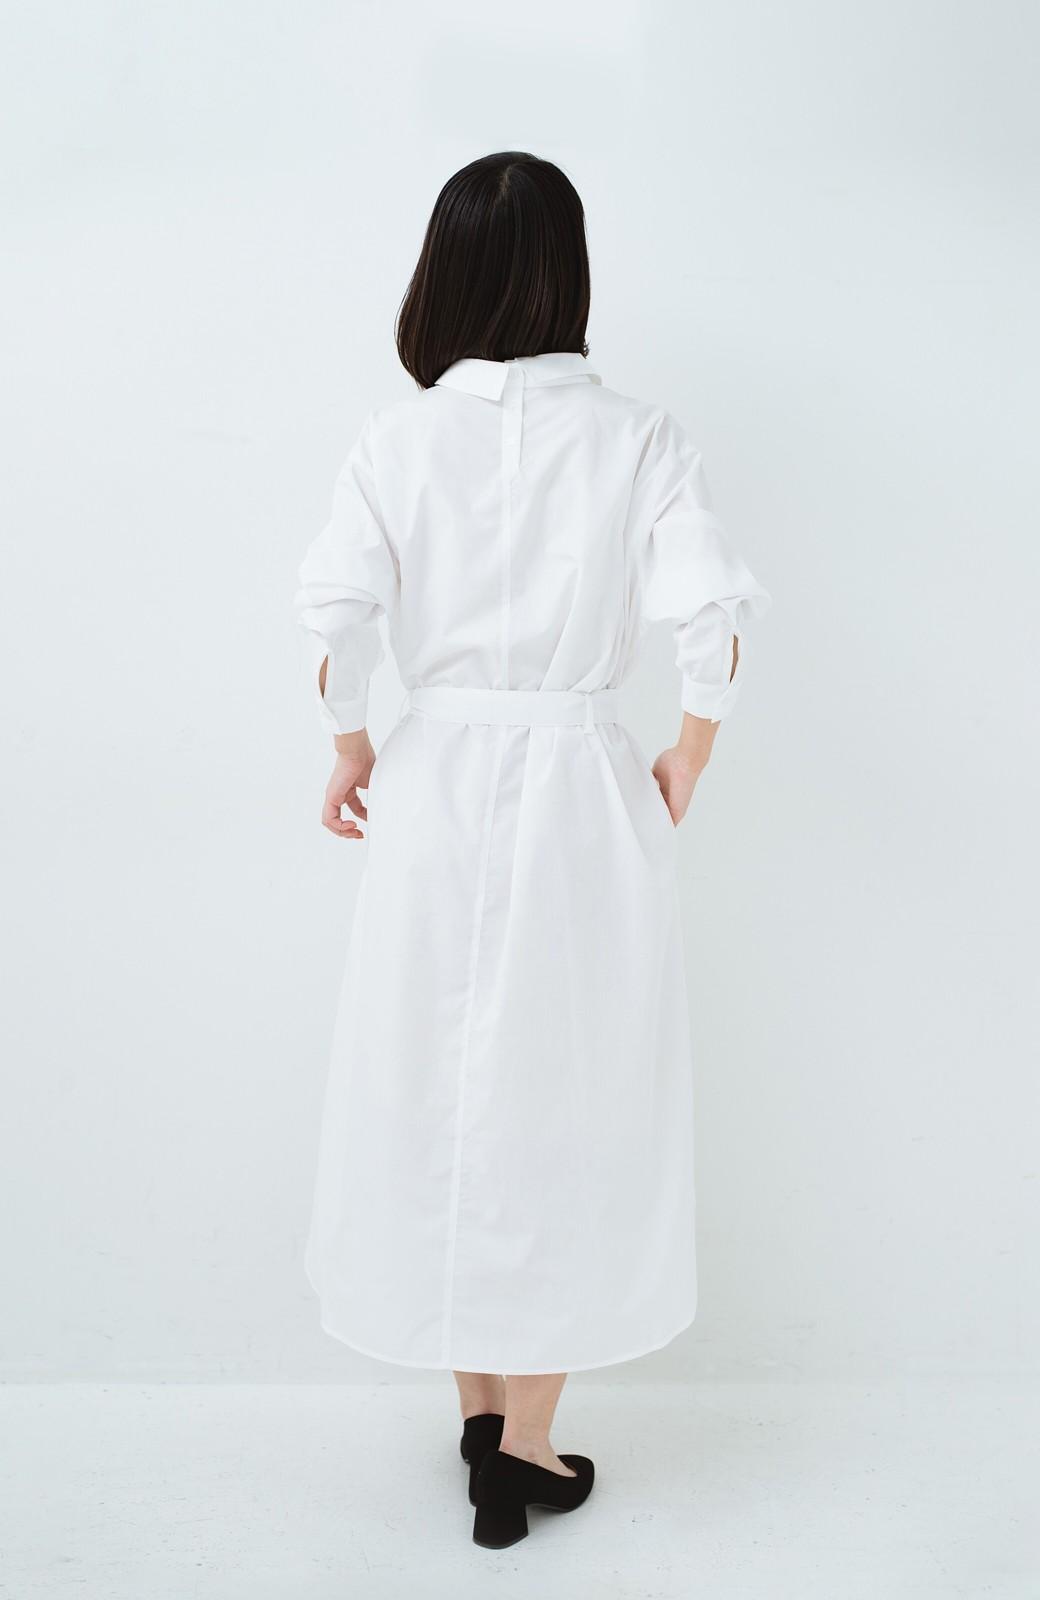 haco! 気持ちが凛と改まる リボン付きオーバーサイズシャツワンピース <ホワイト>の商品写真18